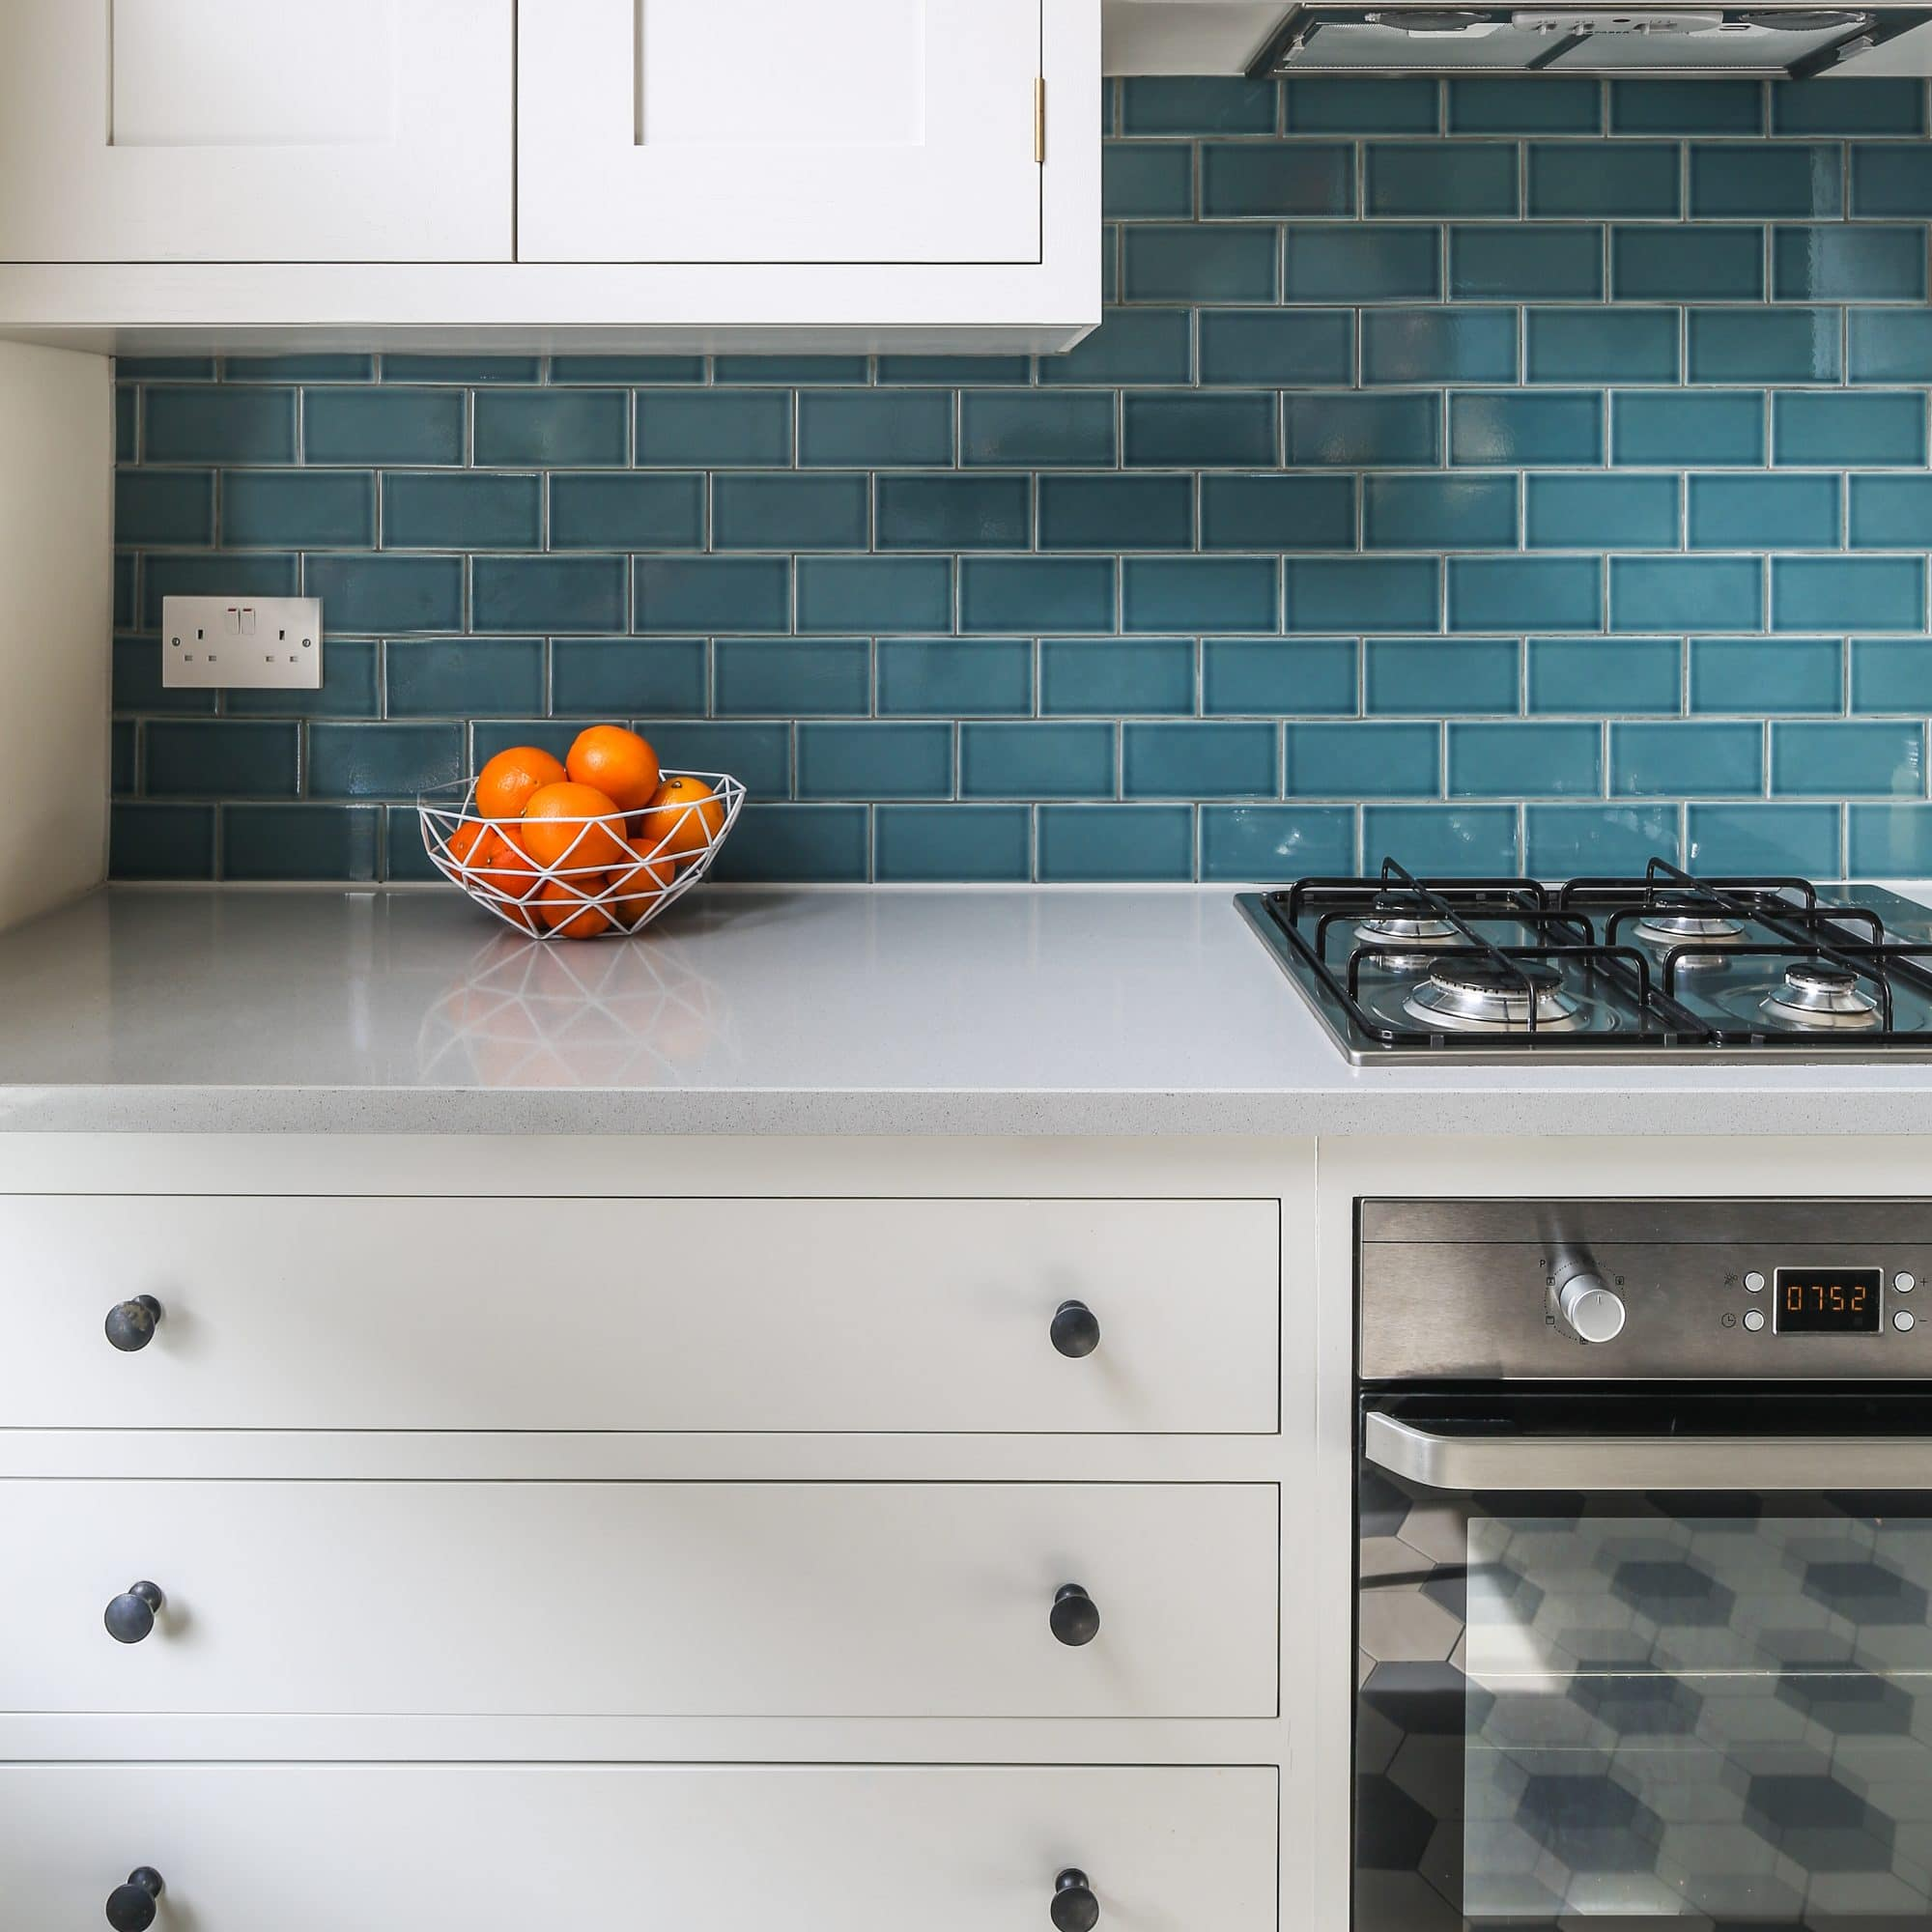 Graebner - Quirky Retro Style Shaker Kitchen - Sustainable Kitchens